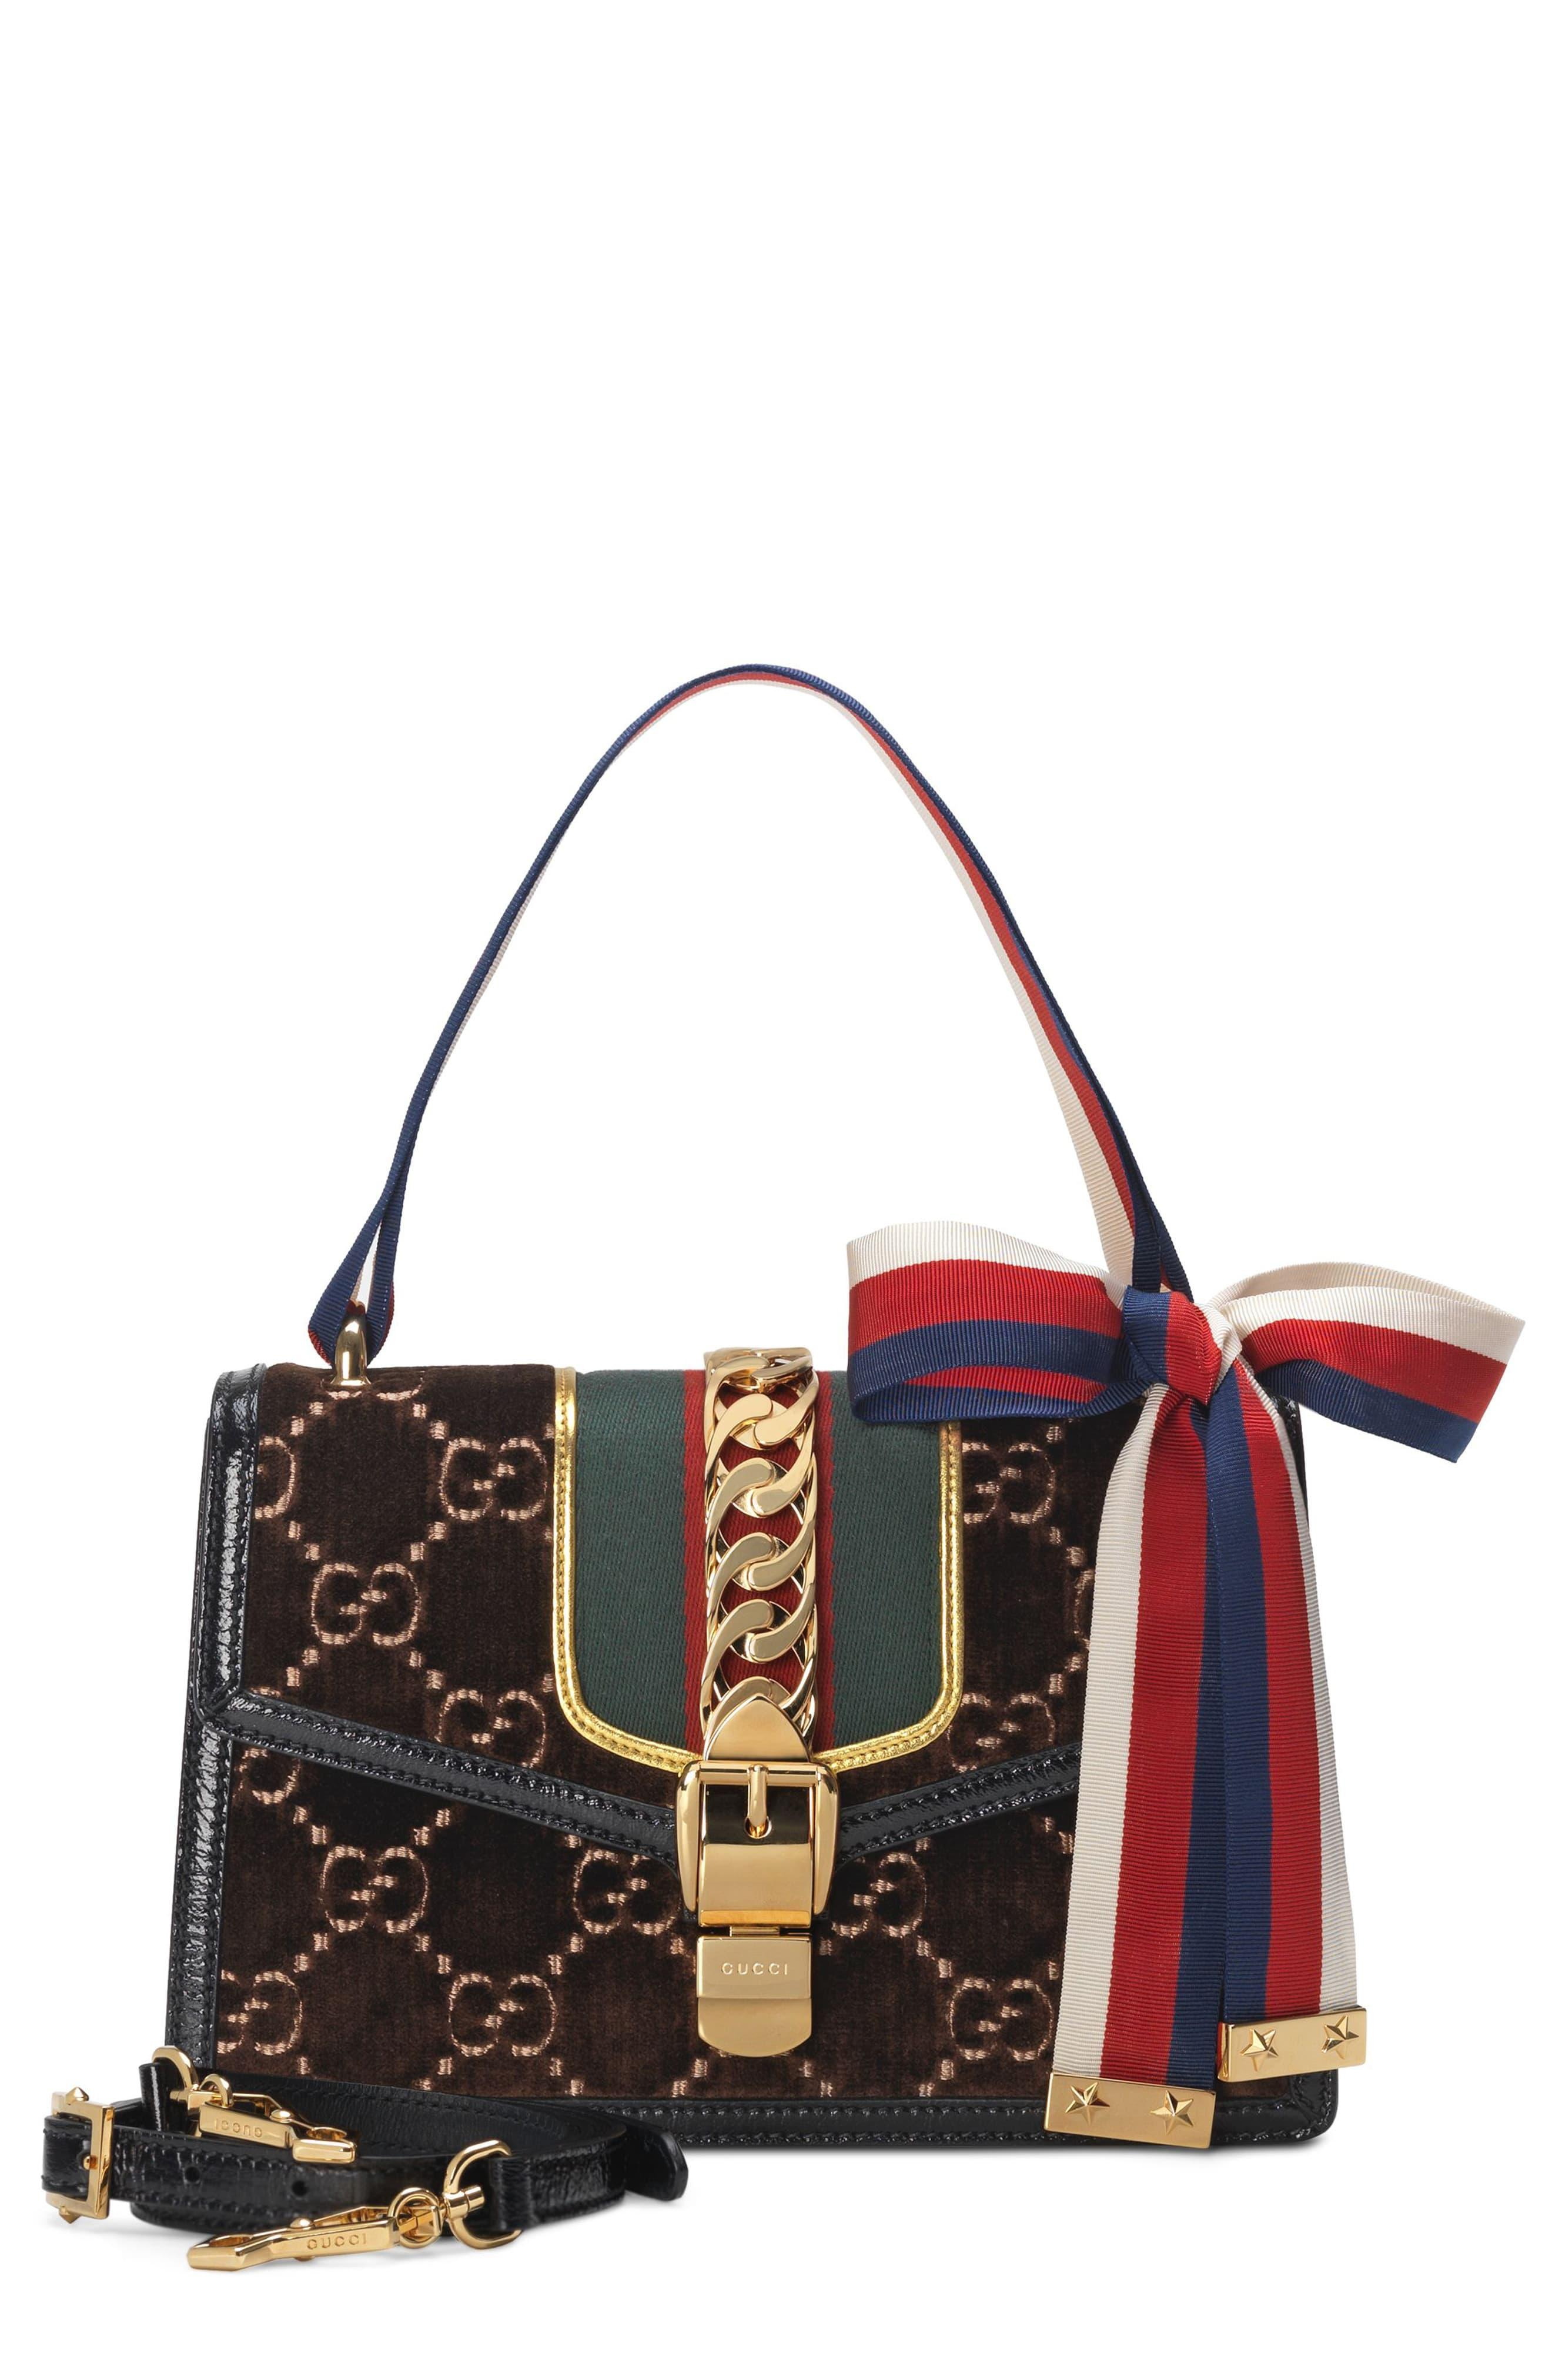 7dc6420f6 Gucci Small Sylvie Velvet Shoulder Bag - in Red - Lyst